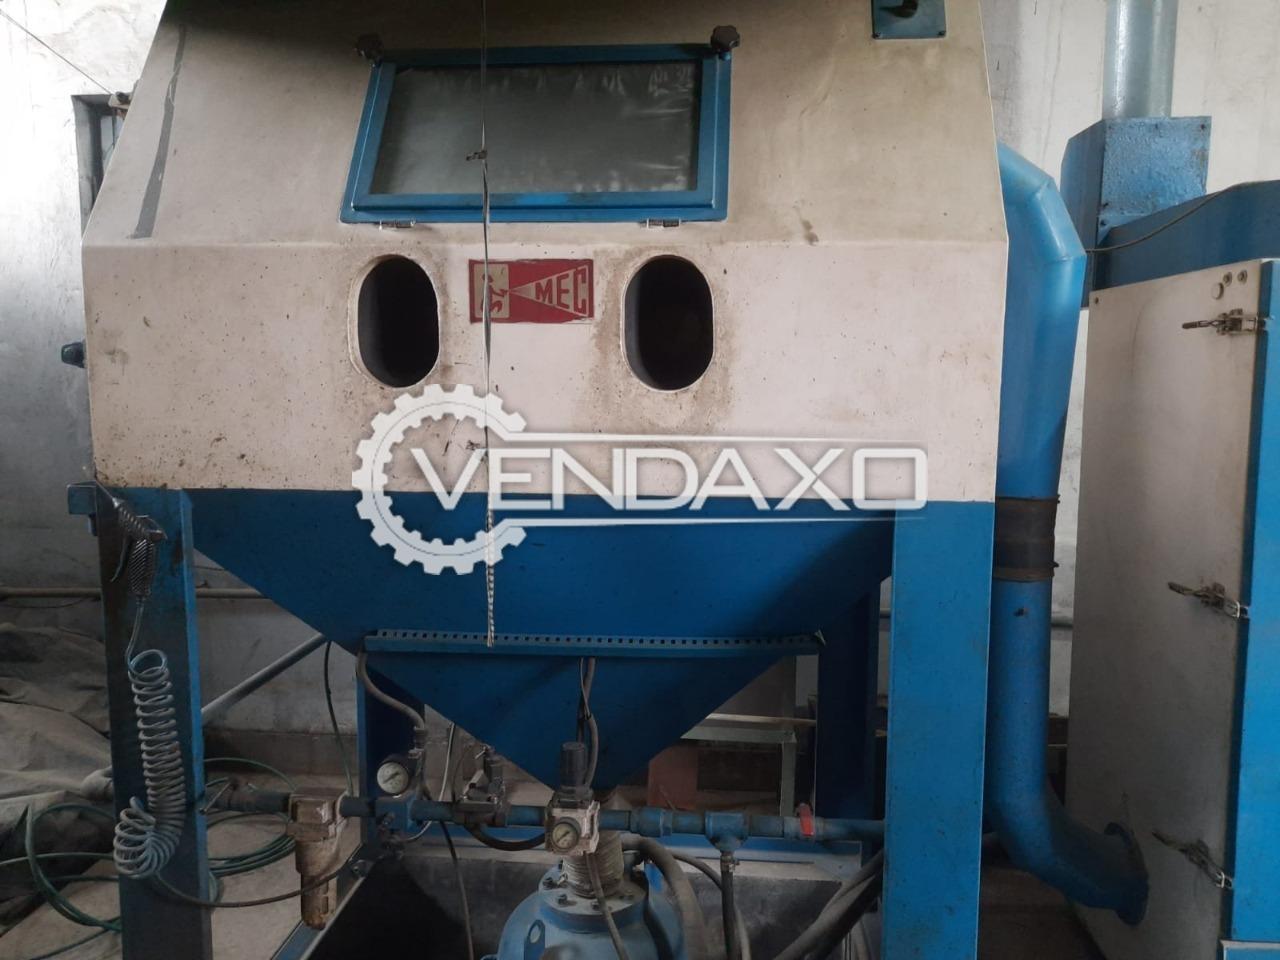 MEC Jodhpur PR-150120-SPL Pressure Blasting Cabinet With Dust Collector & One Additional Boron - Nozzle - 6 mm